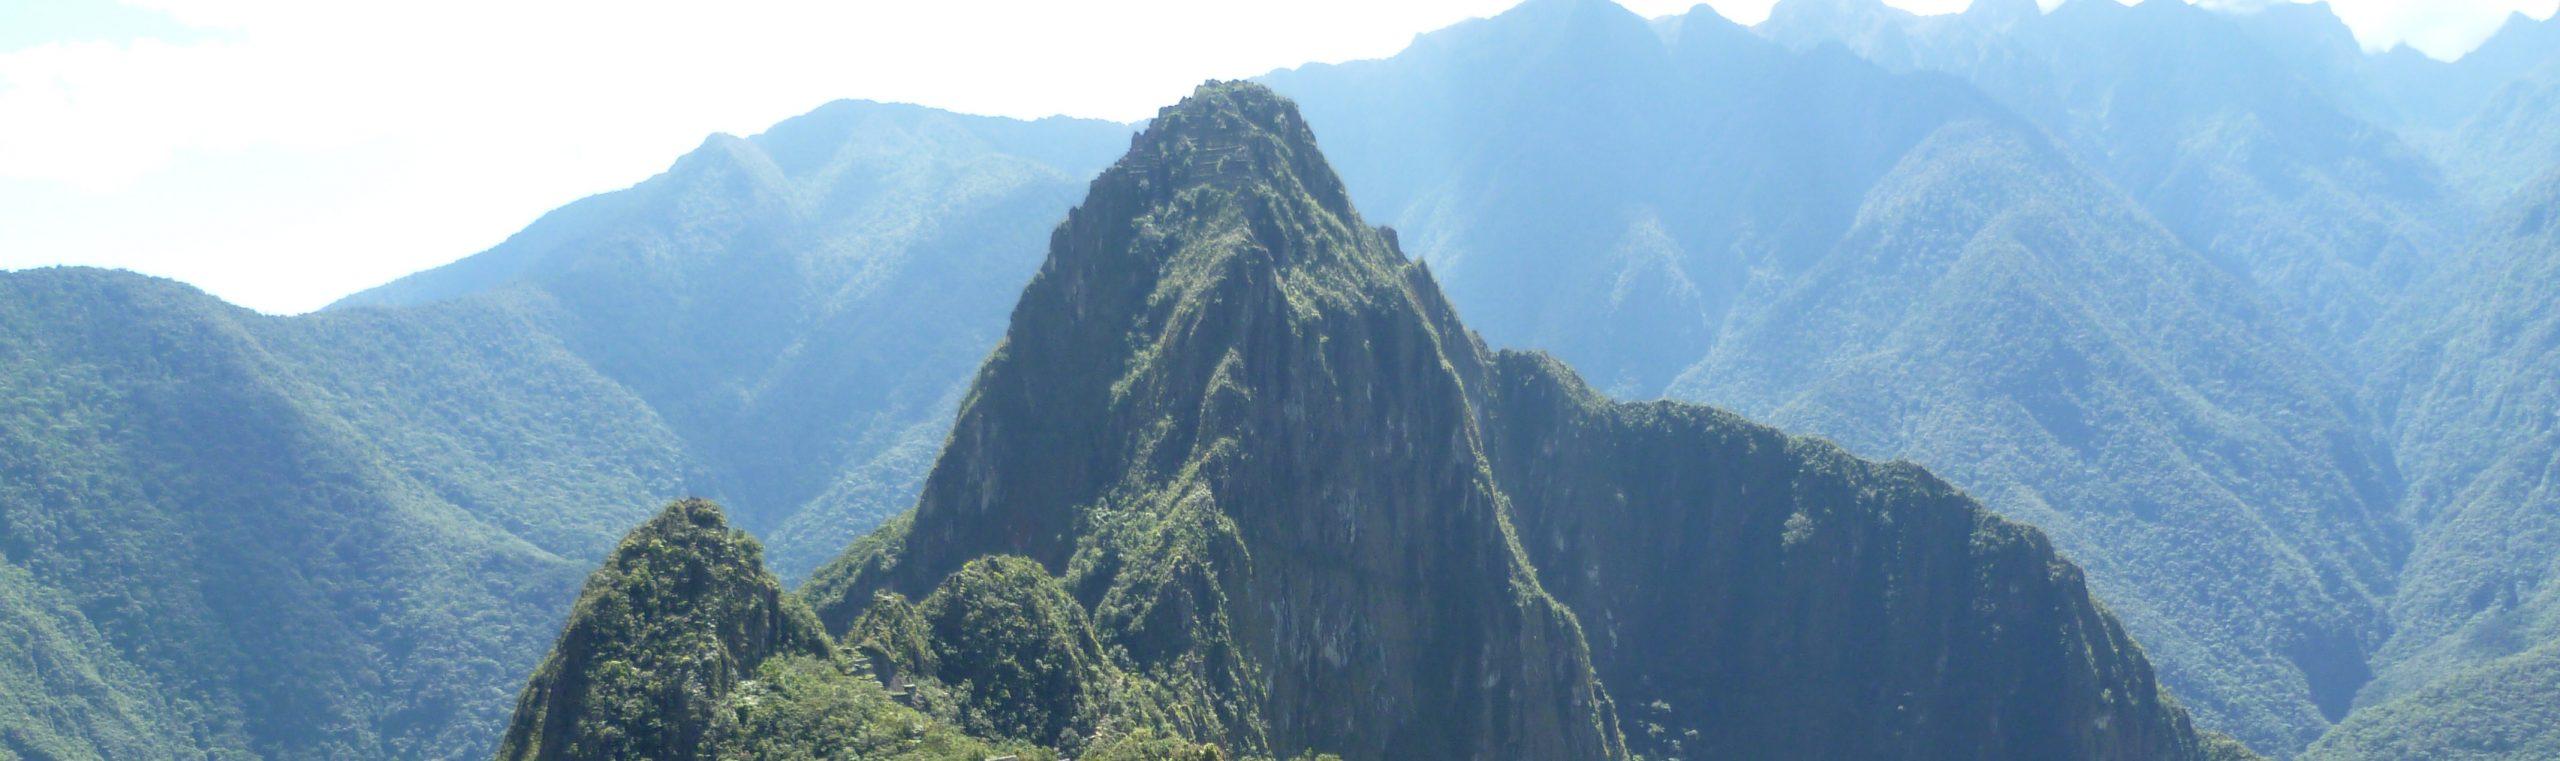 The Inca Empire - Lake Titicaca and Machu Pichhu Tour